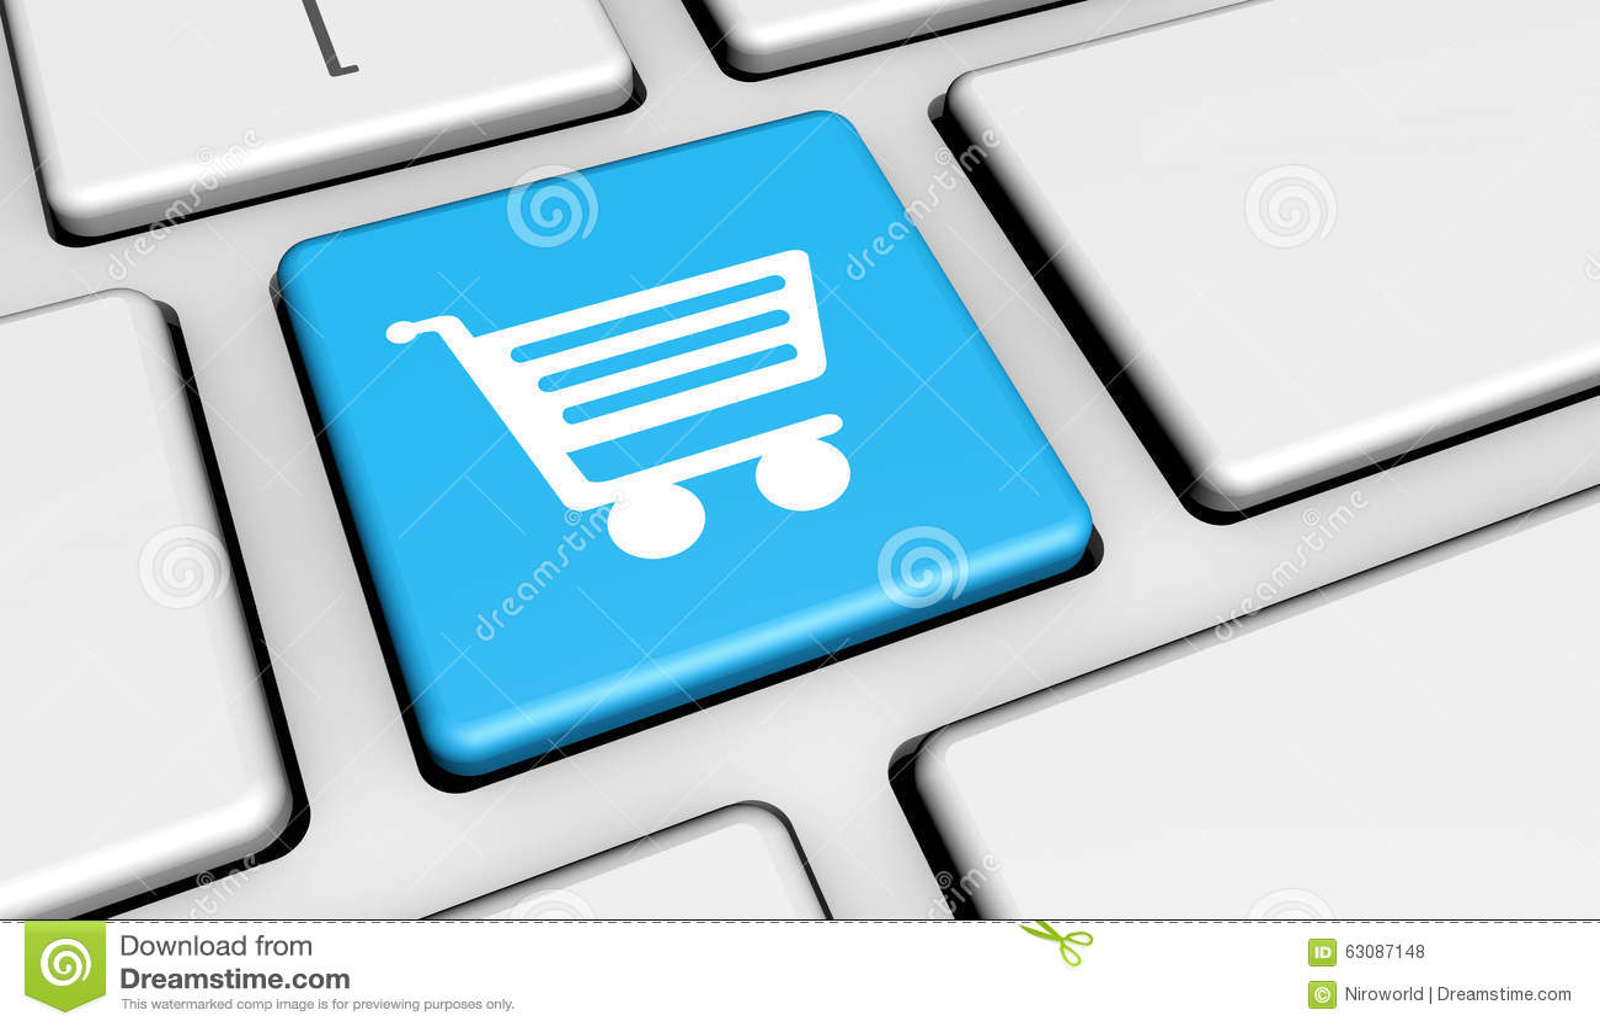 Synthesizer online shopping